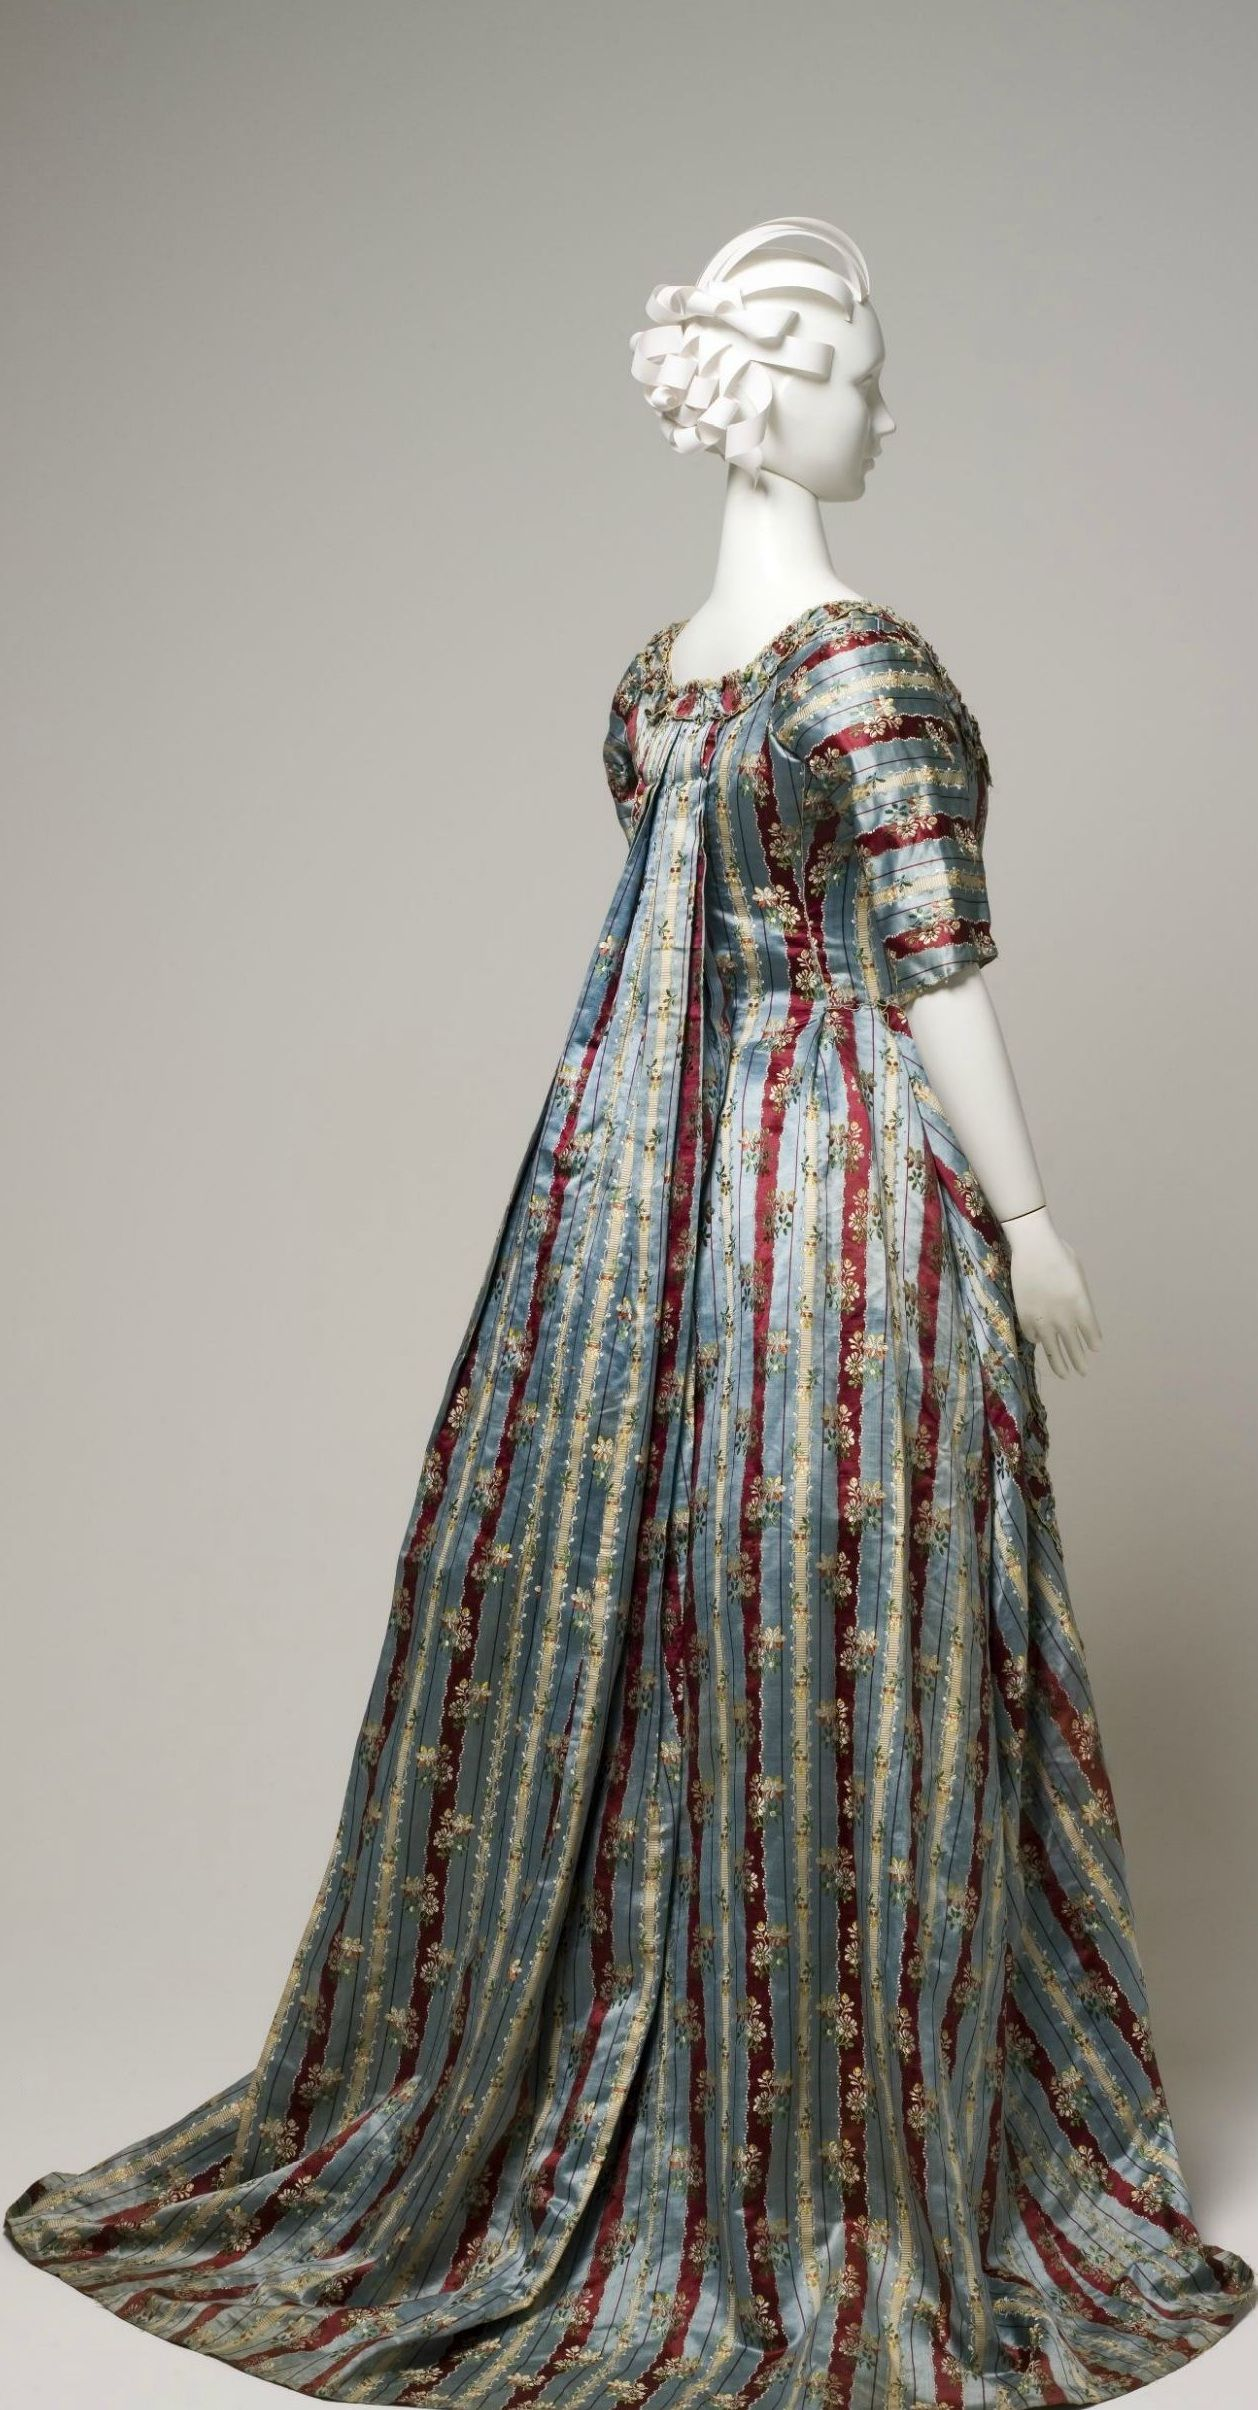 Robe à la française: ca. 1770-1779, French brocade maker, English, silk brocade.